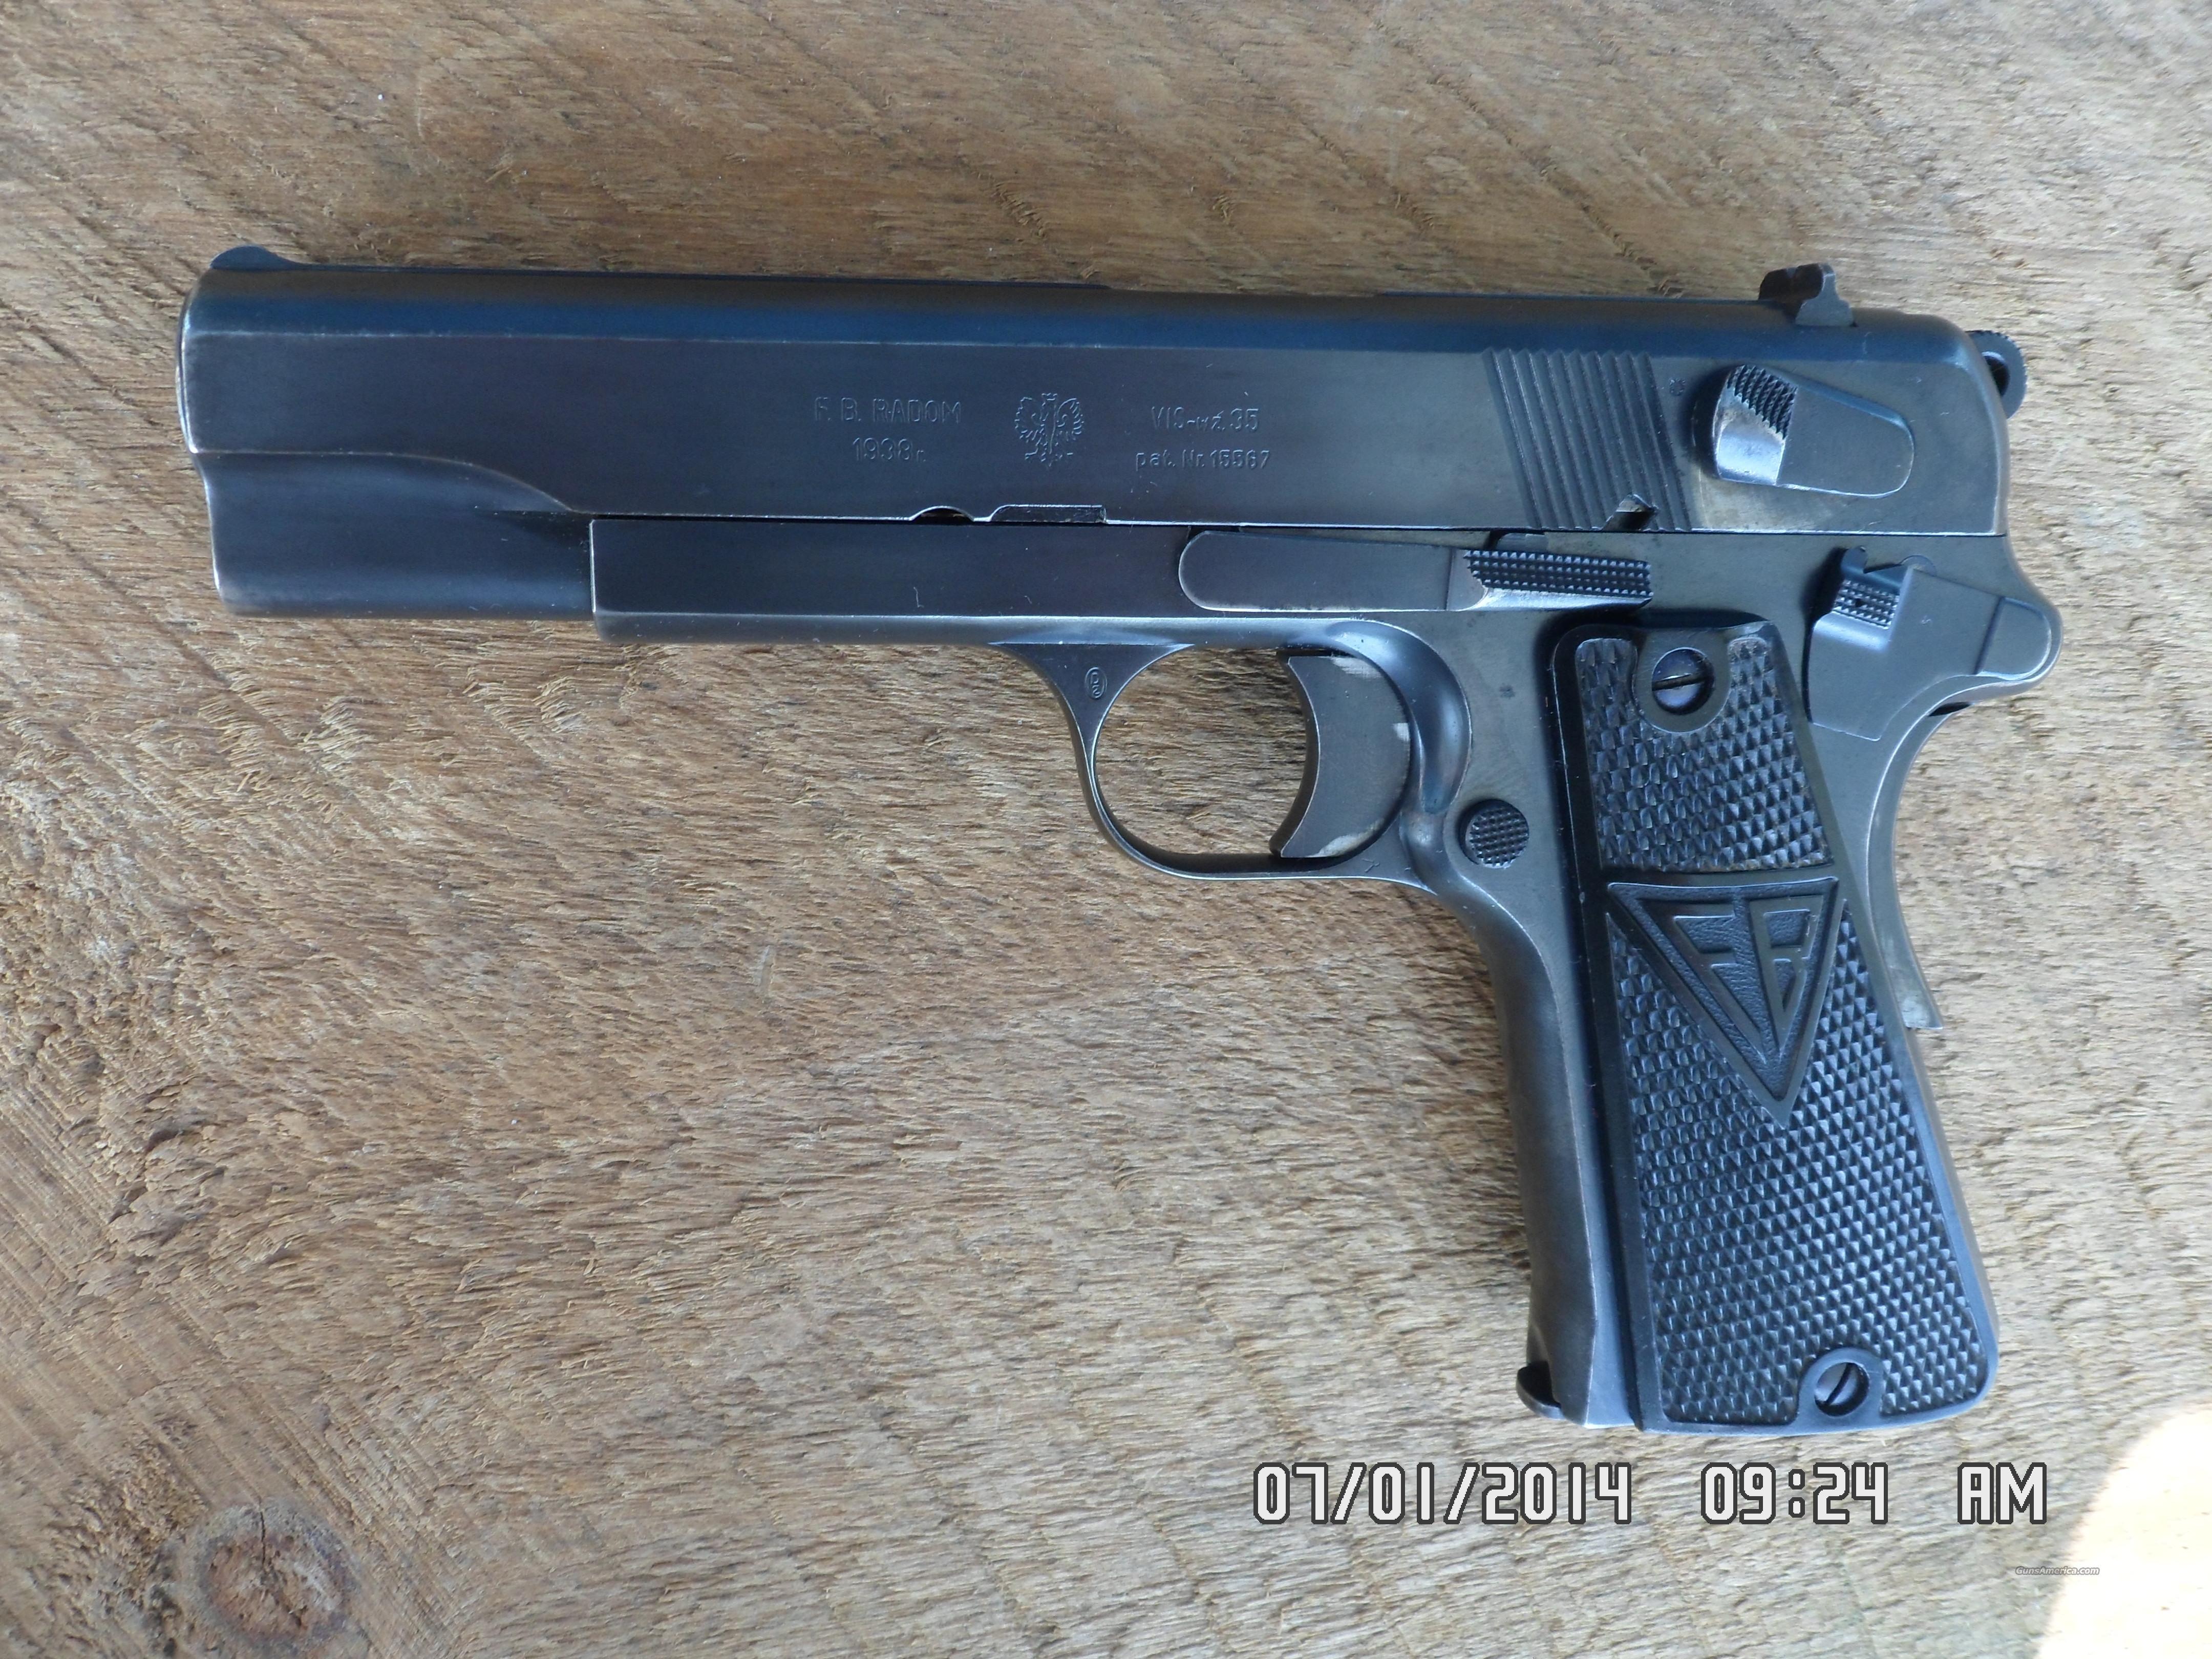 F.B.RADOM 1938 VIS-35 POLISH EAGLE PISTOL 9MM 9... for sale